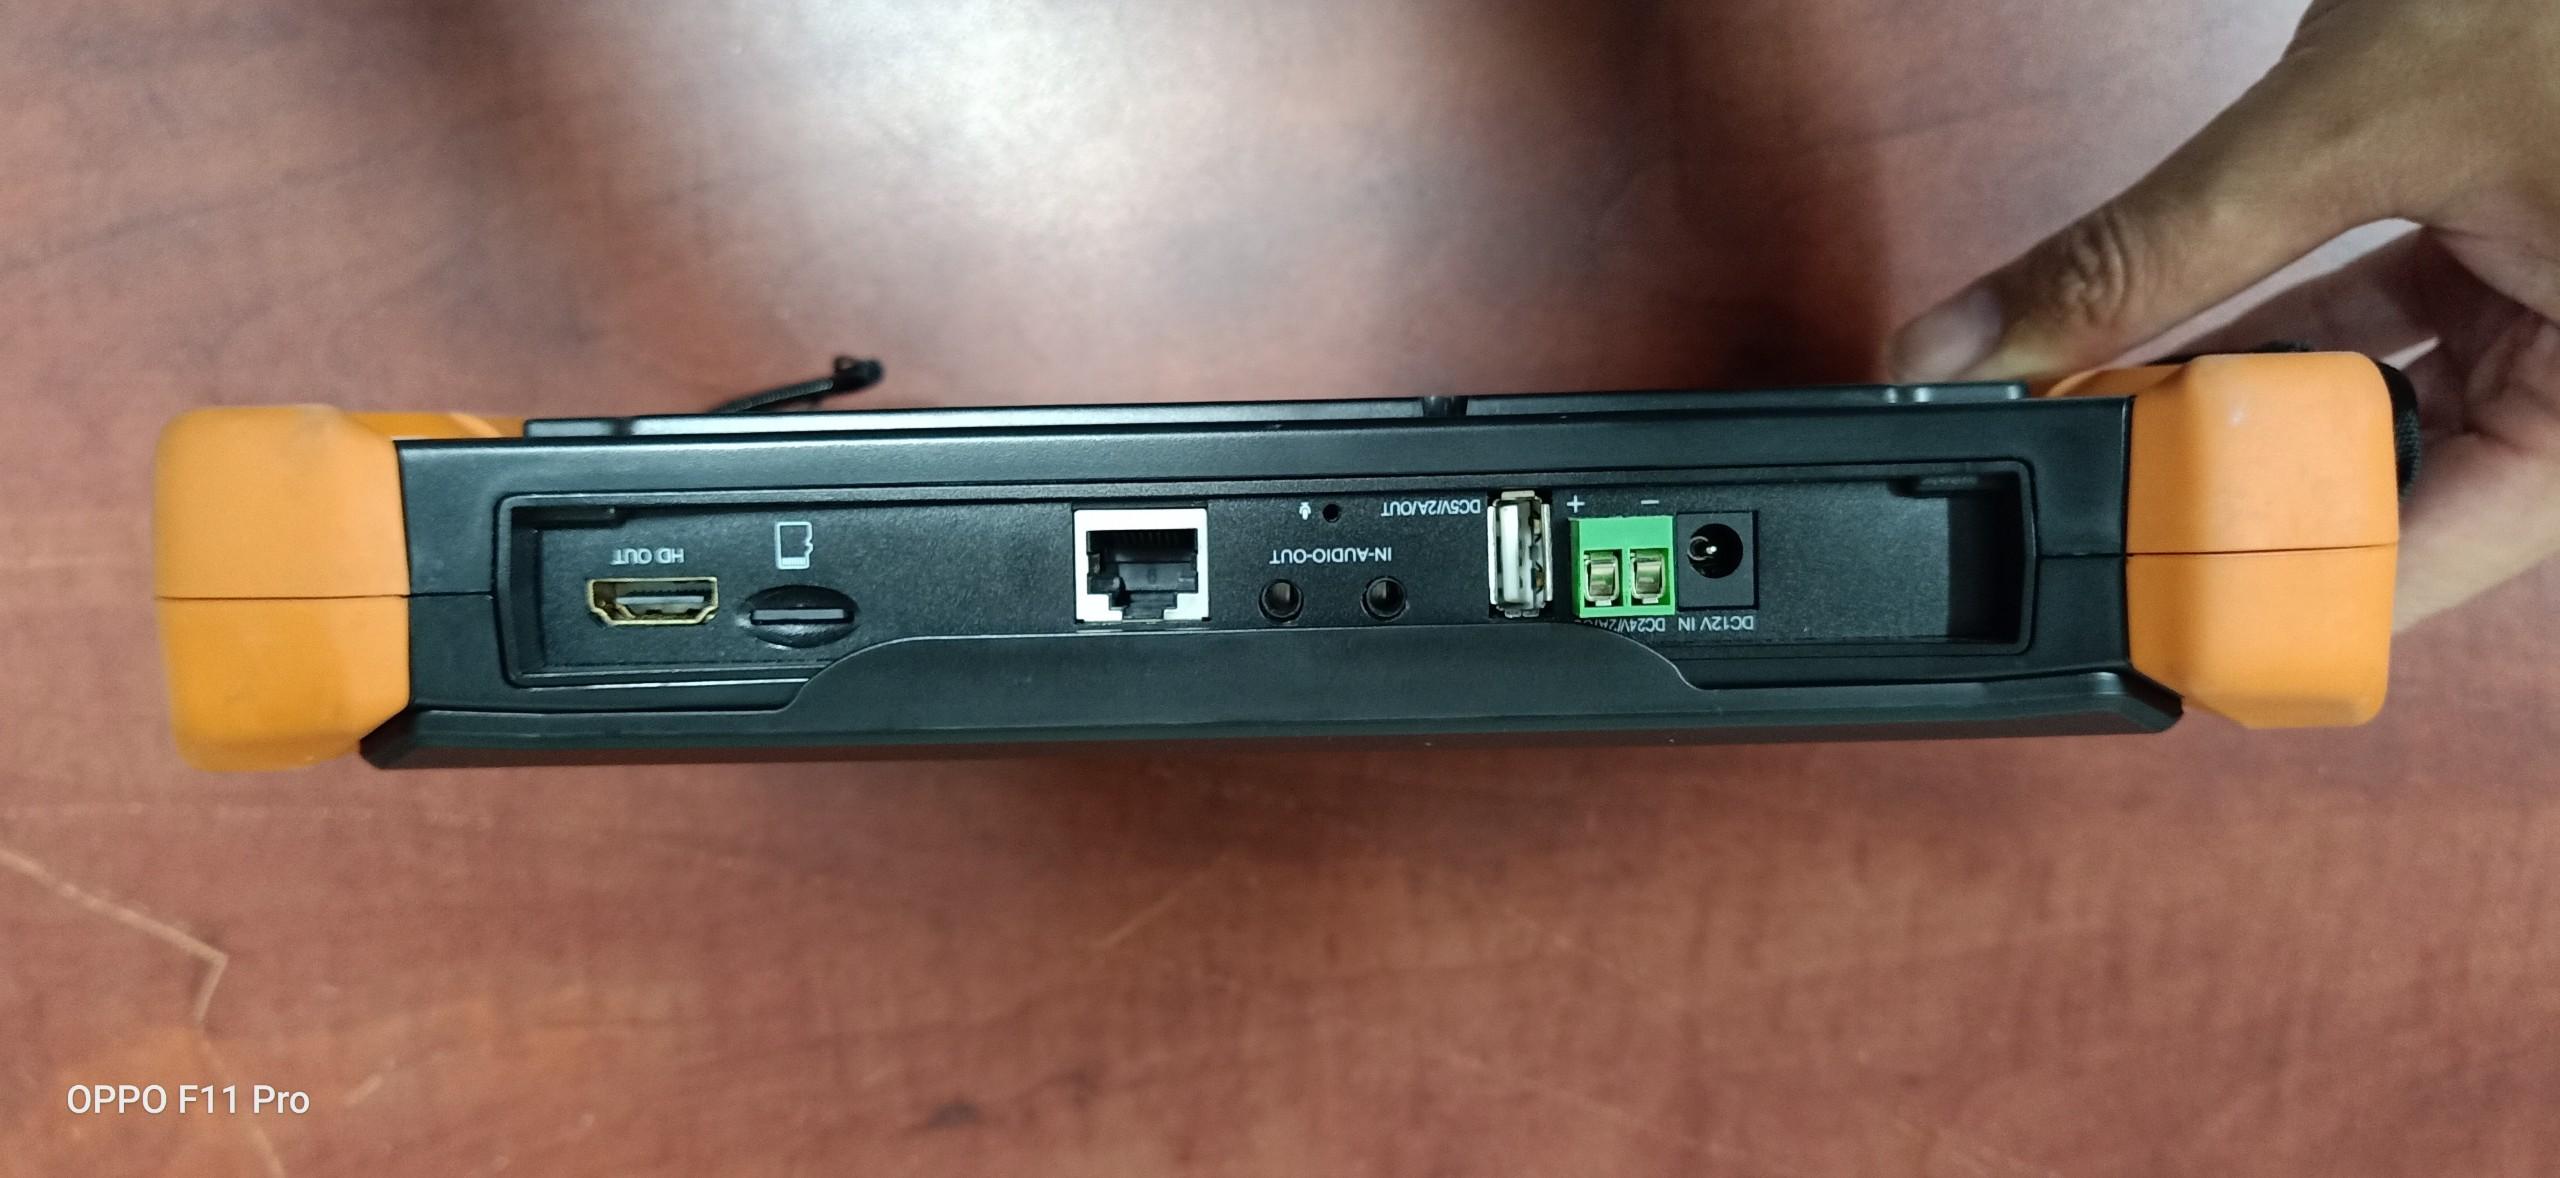 Máy test camera cảm ứng 8inch IP/AHD/TVI/CVI/HD-SDI 8.0MP HDMI in & output FC-900PRO